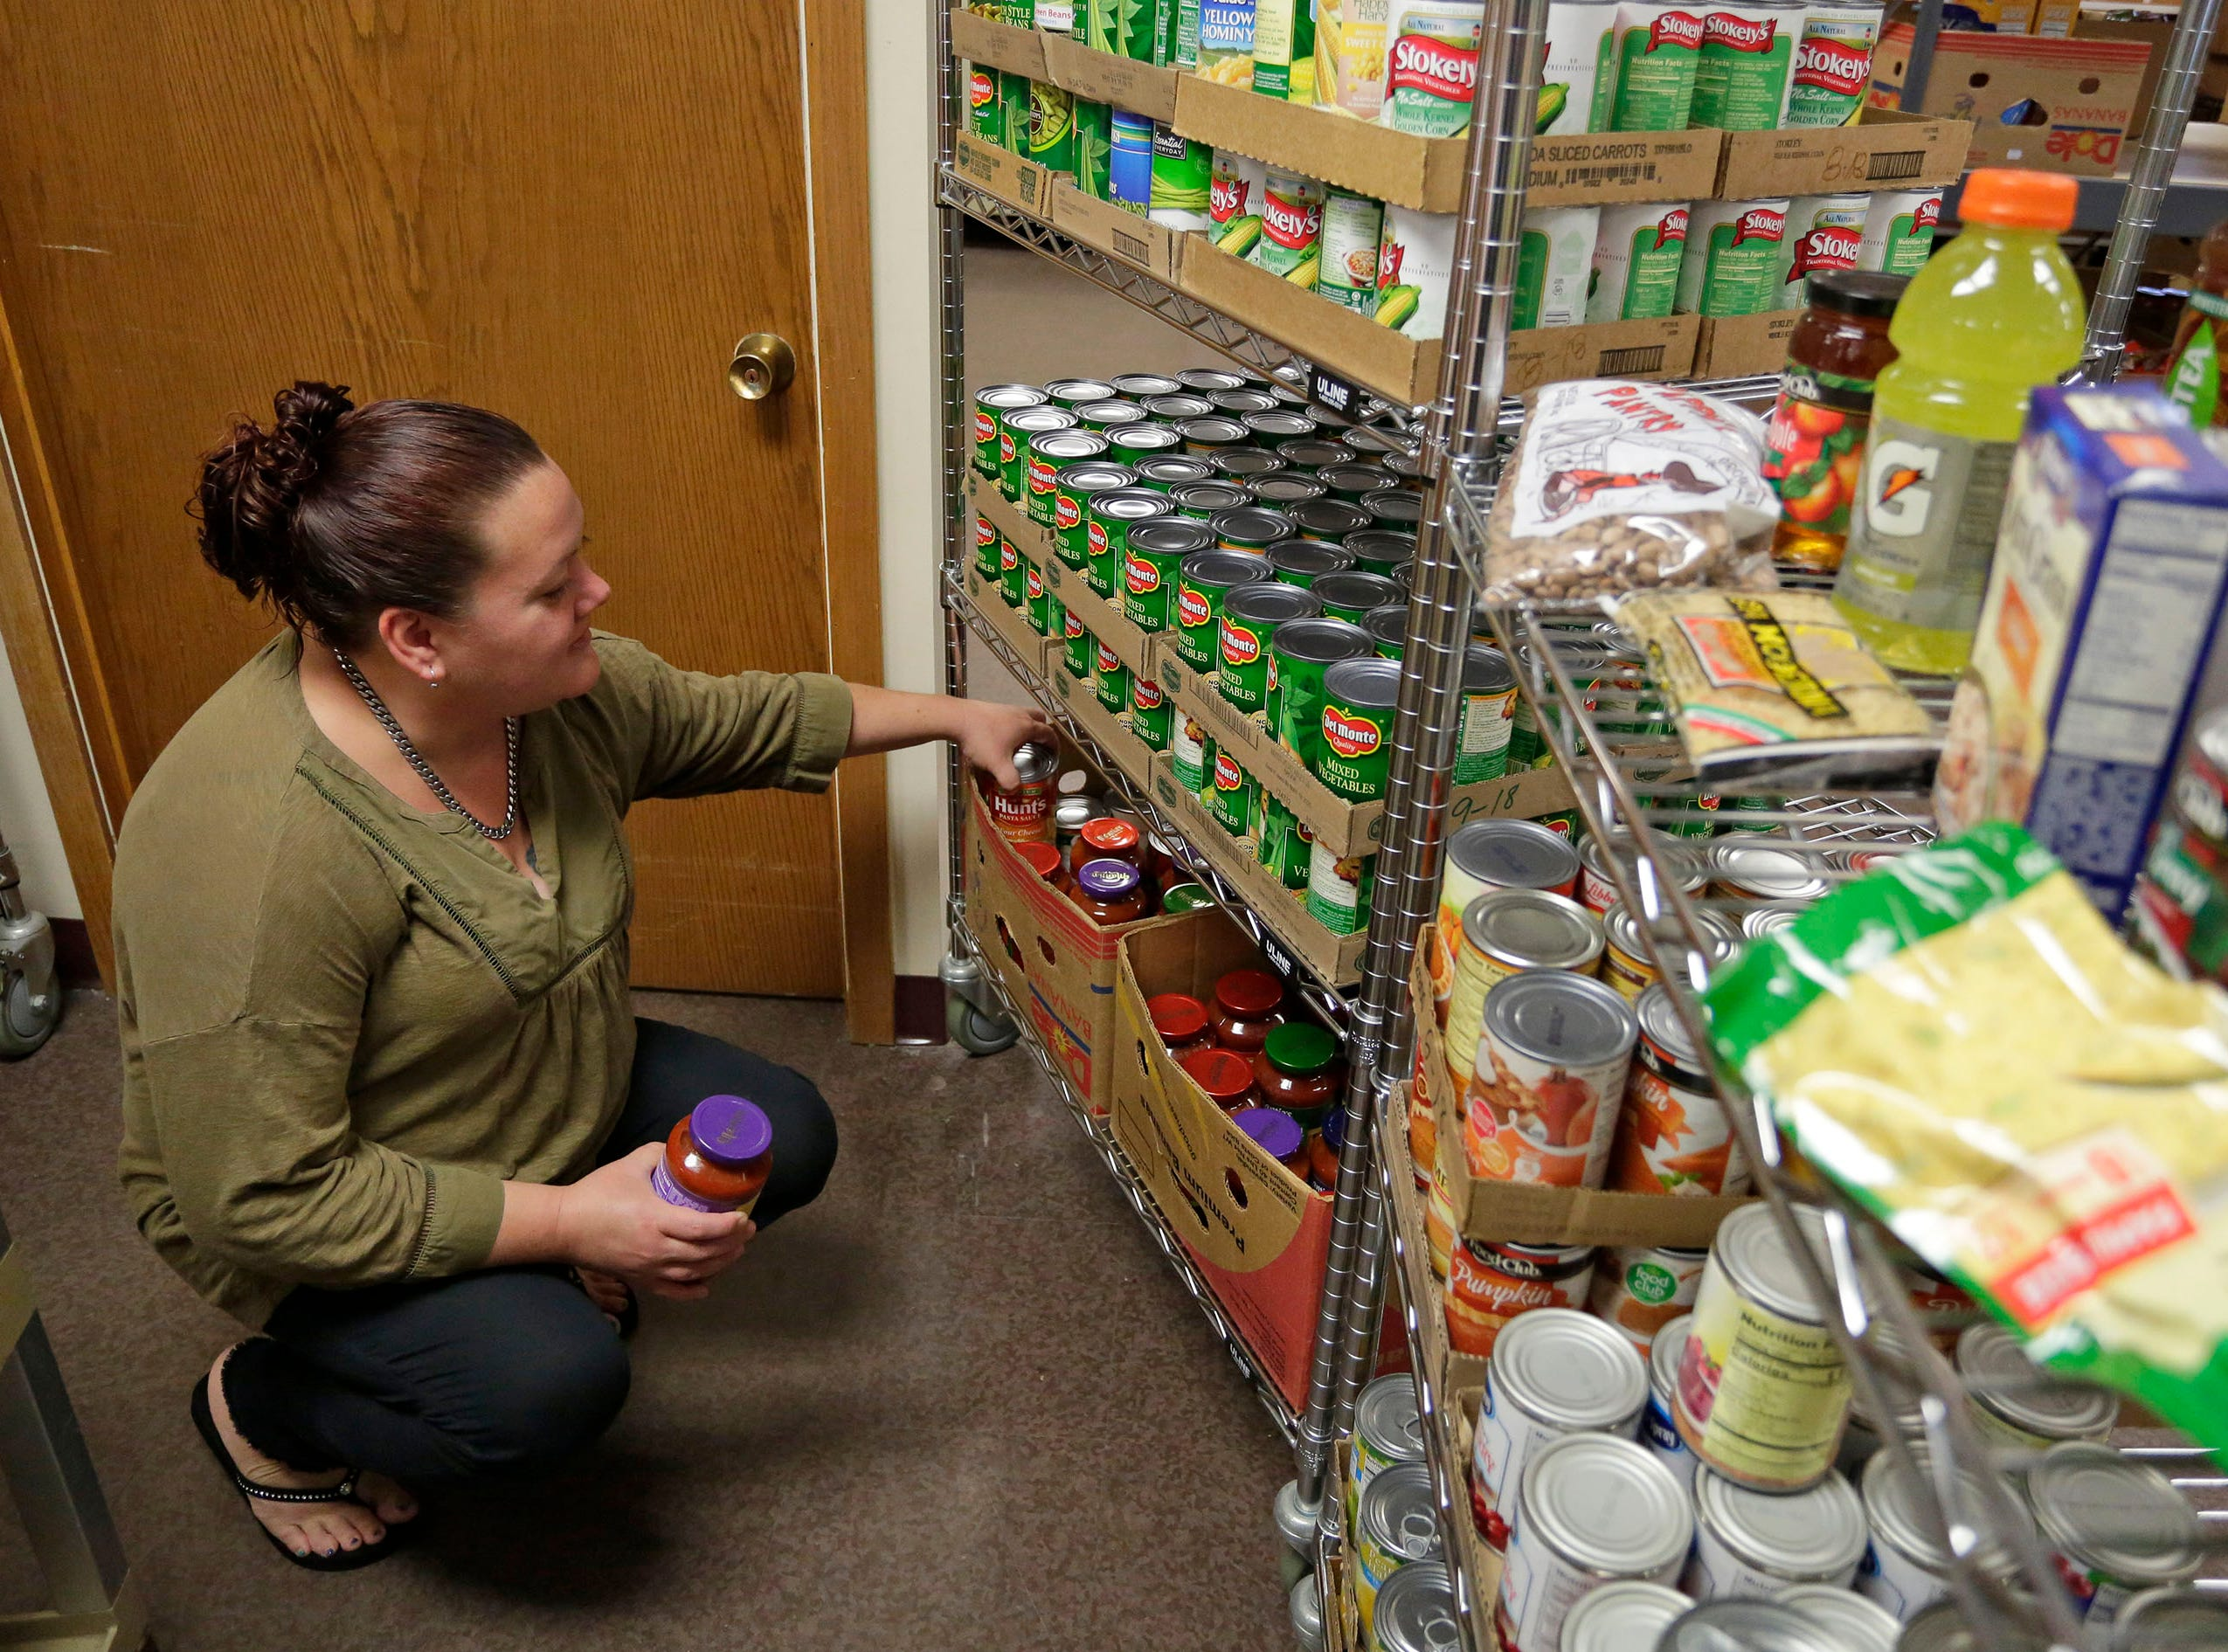 Sheboygan Salvation Army food pantry recipient Rose Hauch, of Sheboygan, Wis., selects food, Thursday, September 20, 2018, in Sheboygan, Wis.